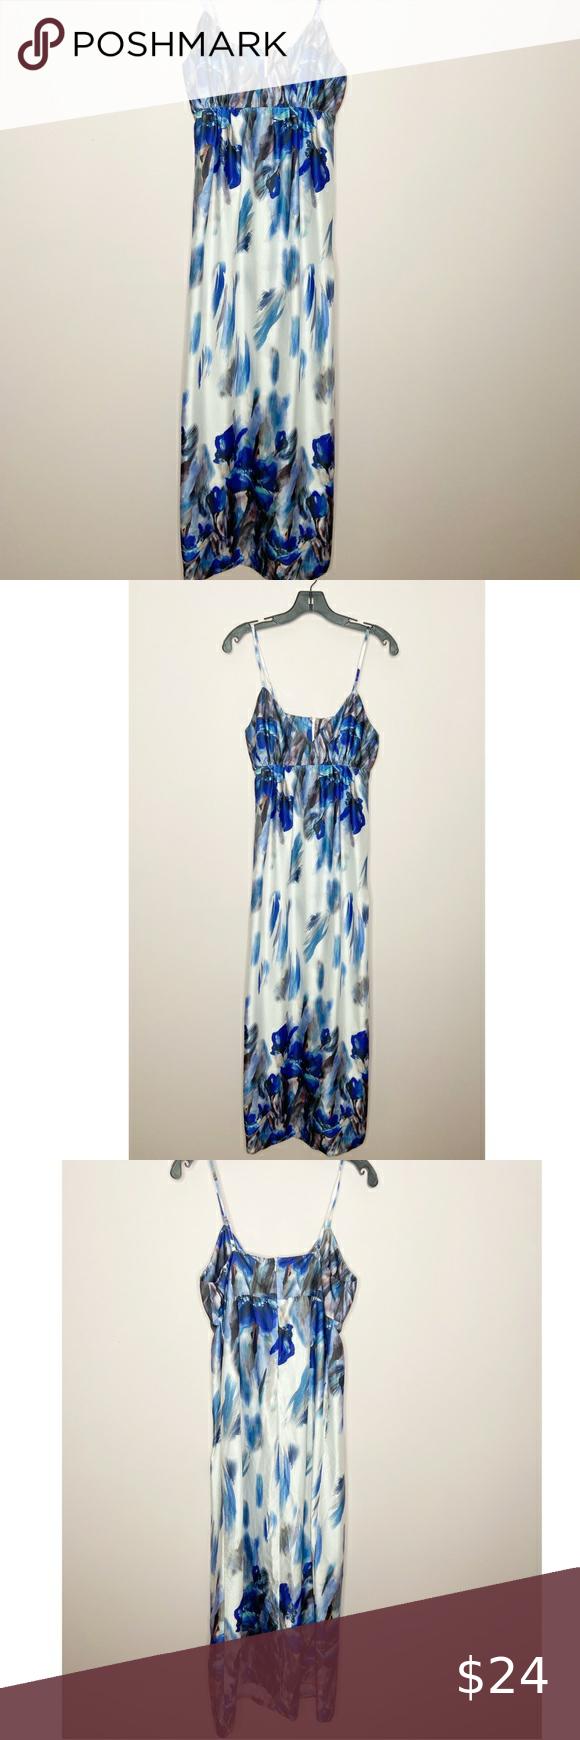 Sami Dani Blue Watercolor Maxi Dress In 2020 Maxi Dress Dresses Dani Dress [ 1740 x 580 Pixel ]